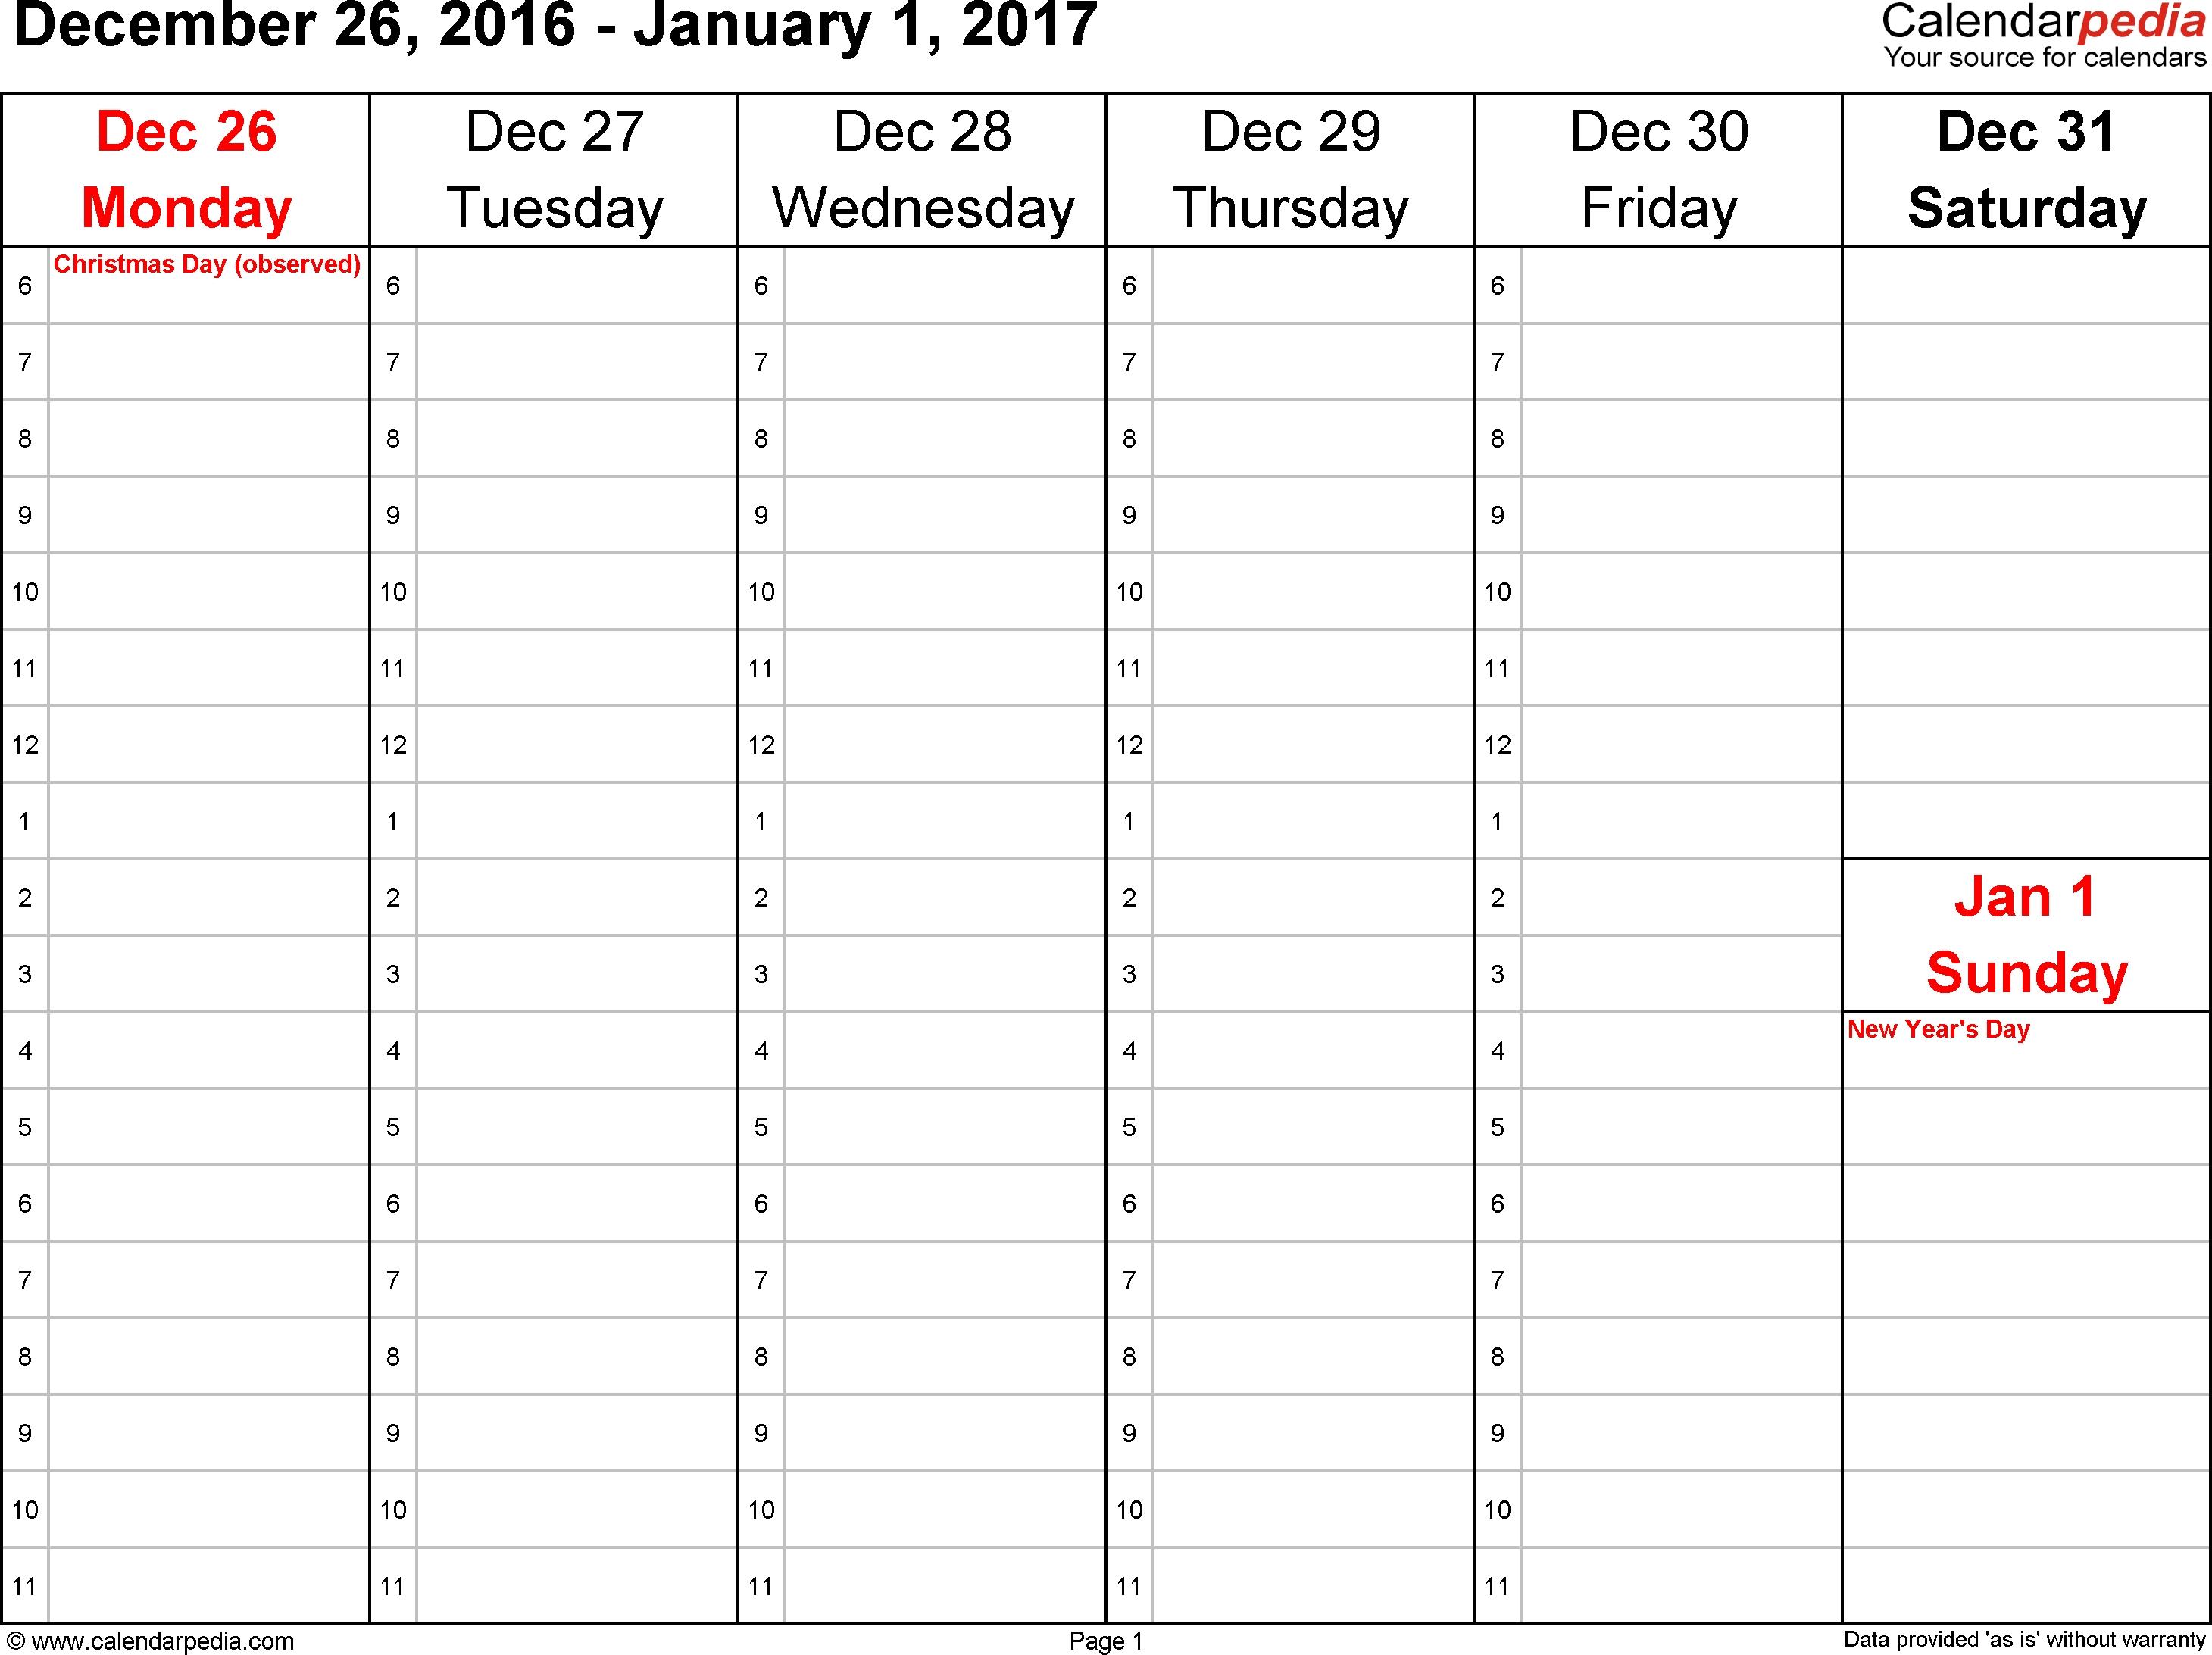 Weekly Calendar 2017 For Word - 12 Free Printable Templates for Weekly Calandar Template Starting Monday